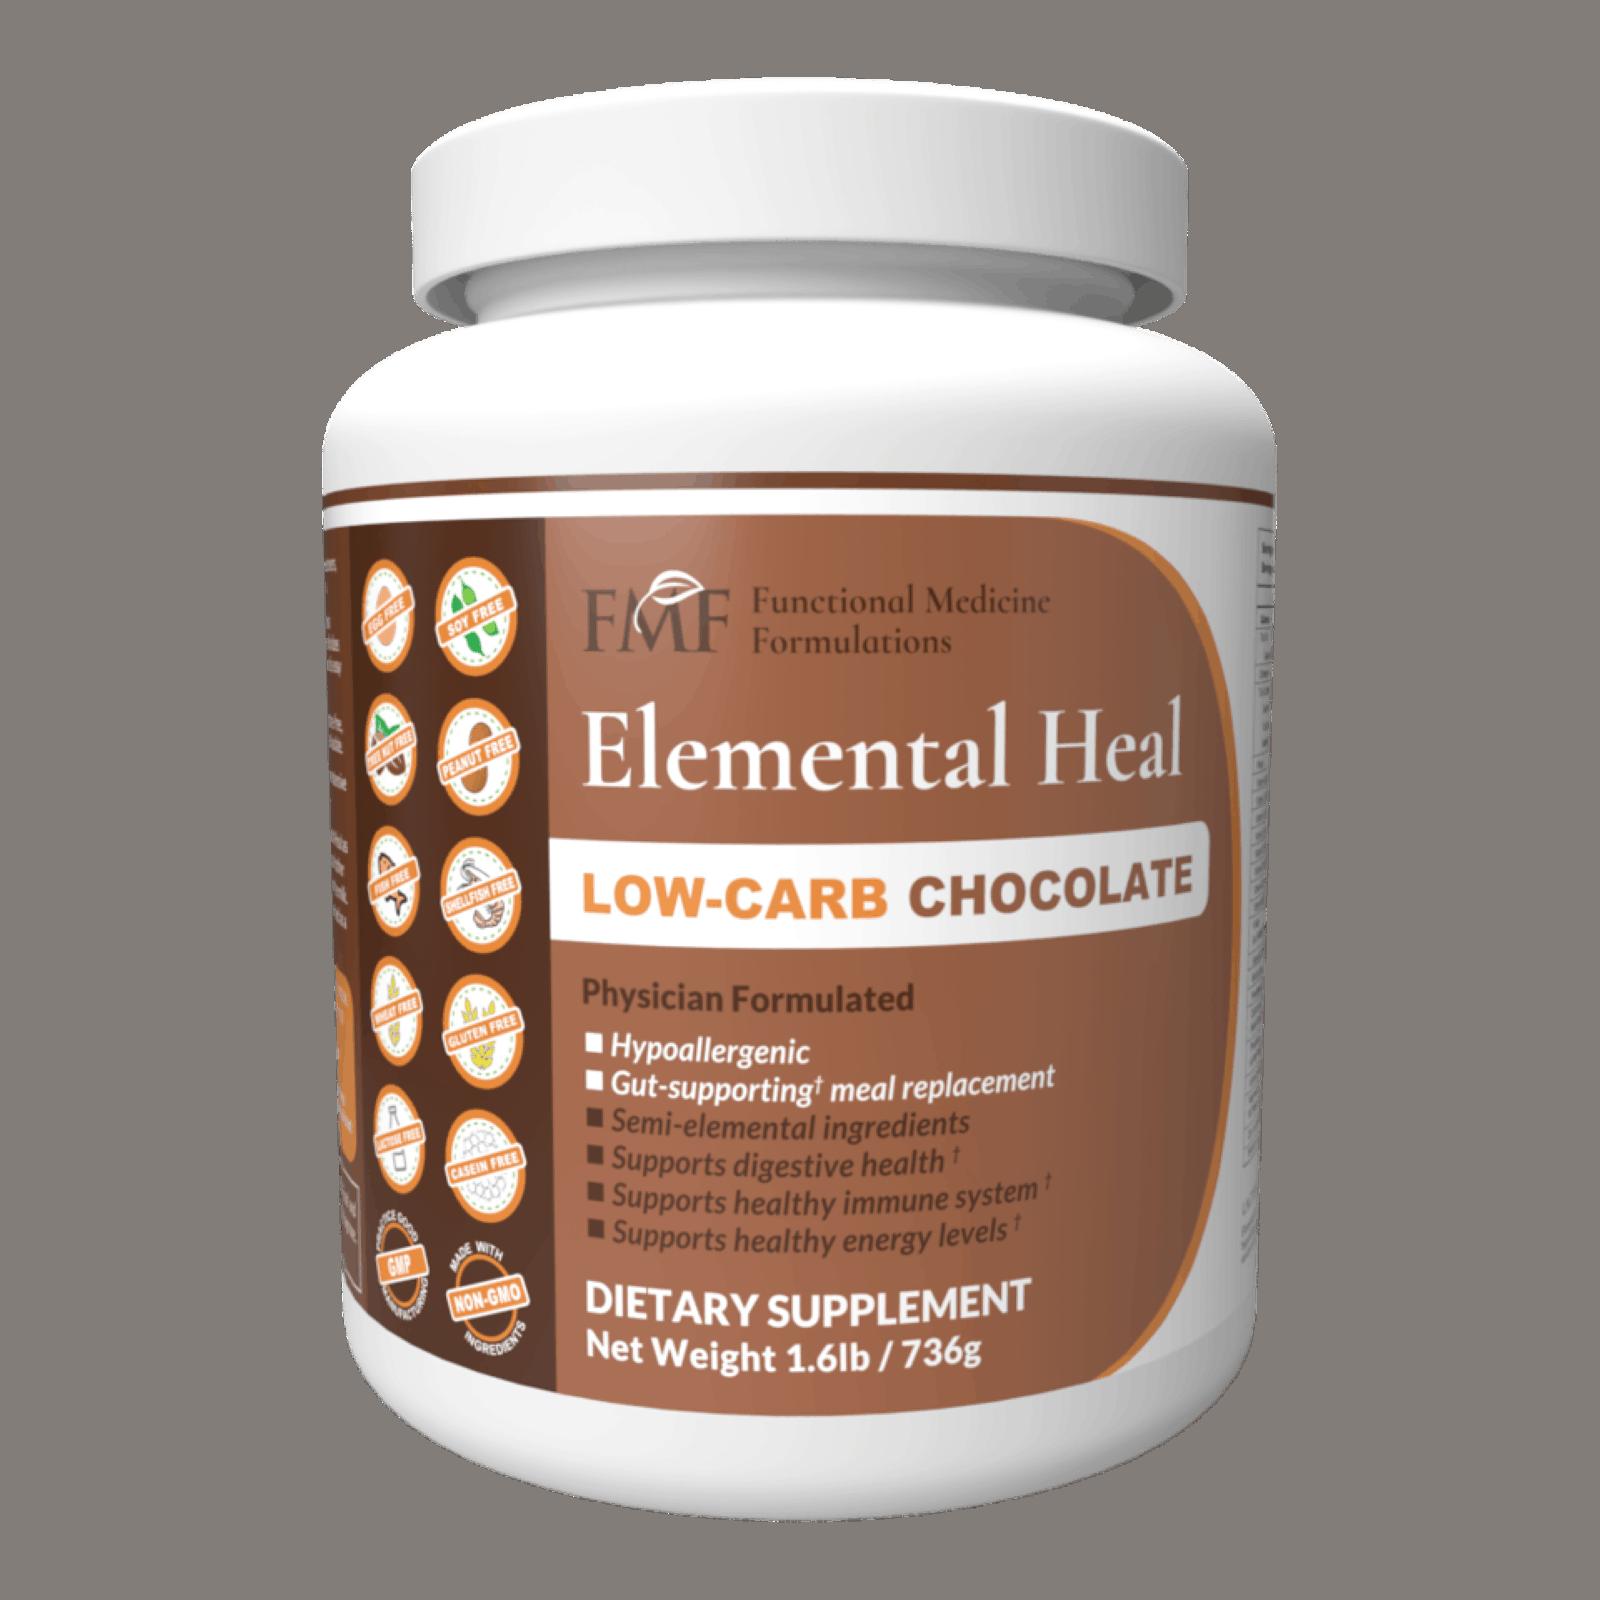 leaky gut diet: Elemental Heal in Low-Carb Chocolate